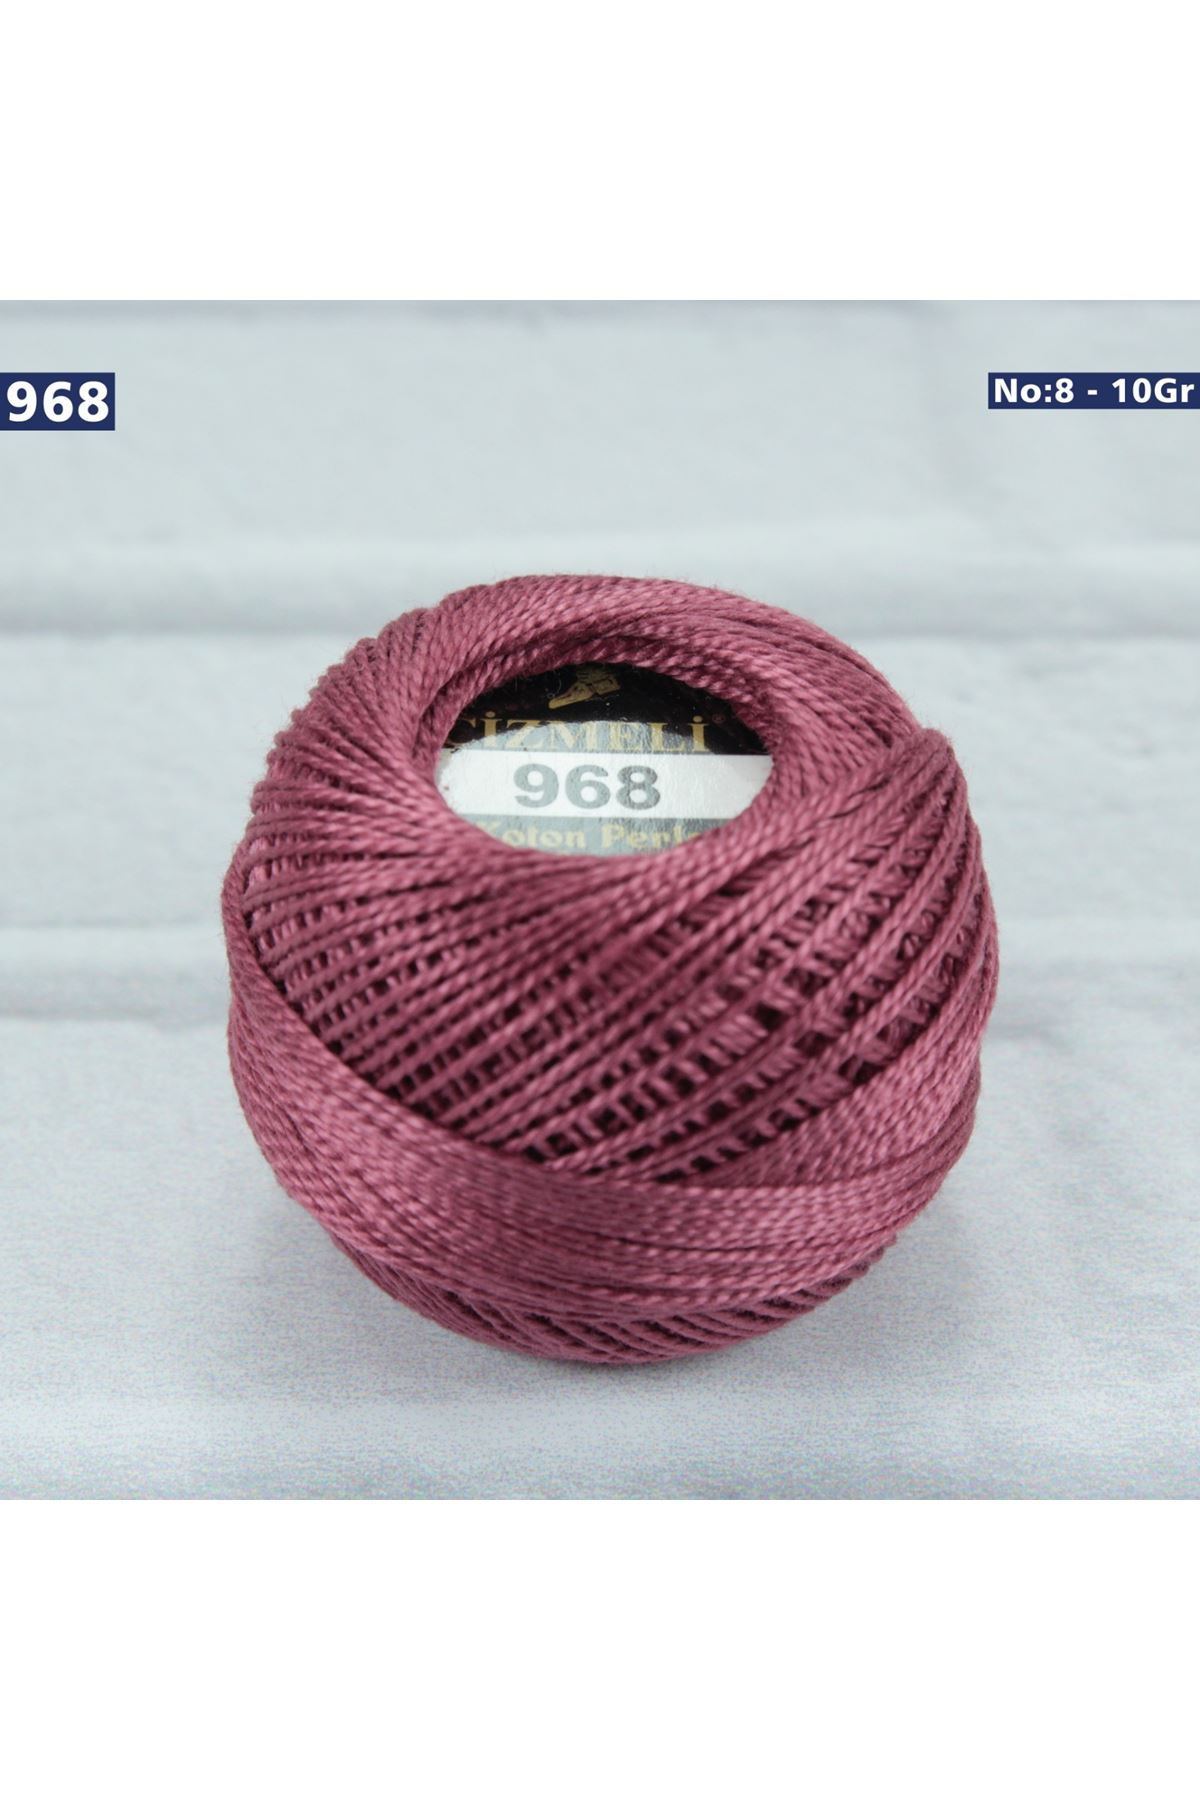 Çizmeli Cotton Perle Nakış İpliği No: 968